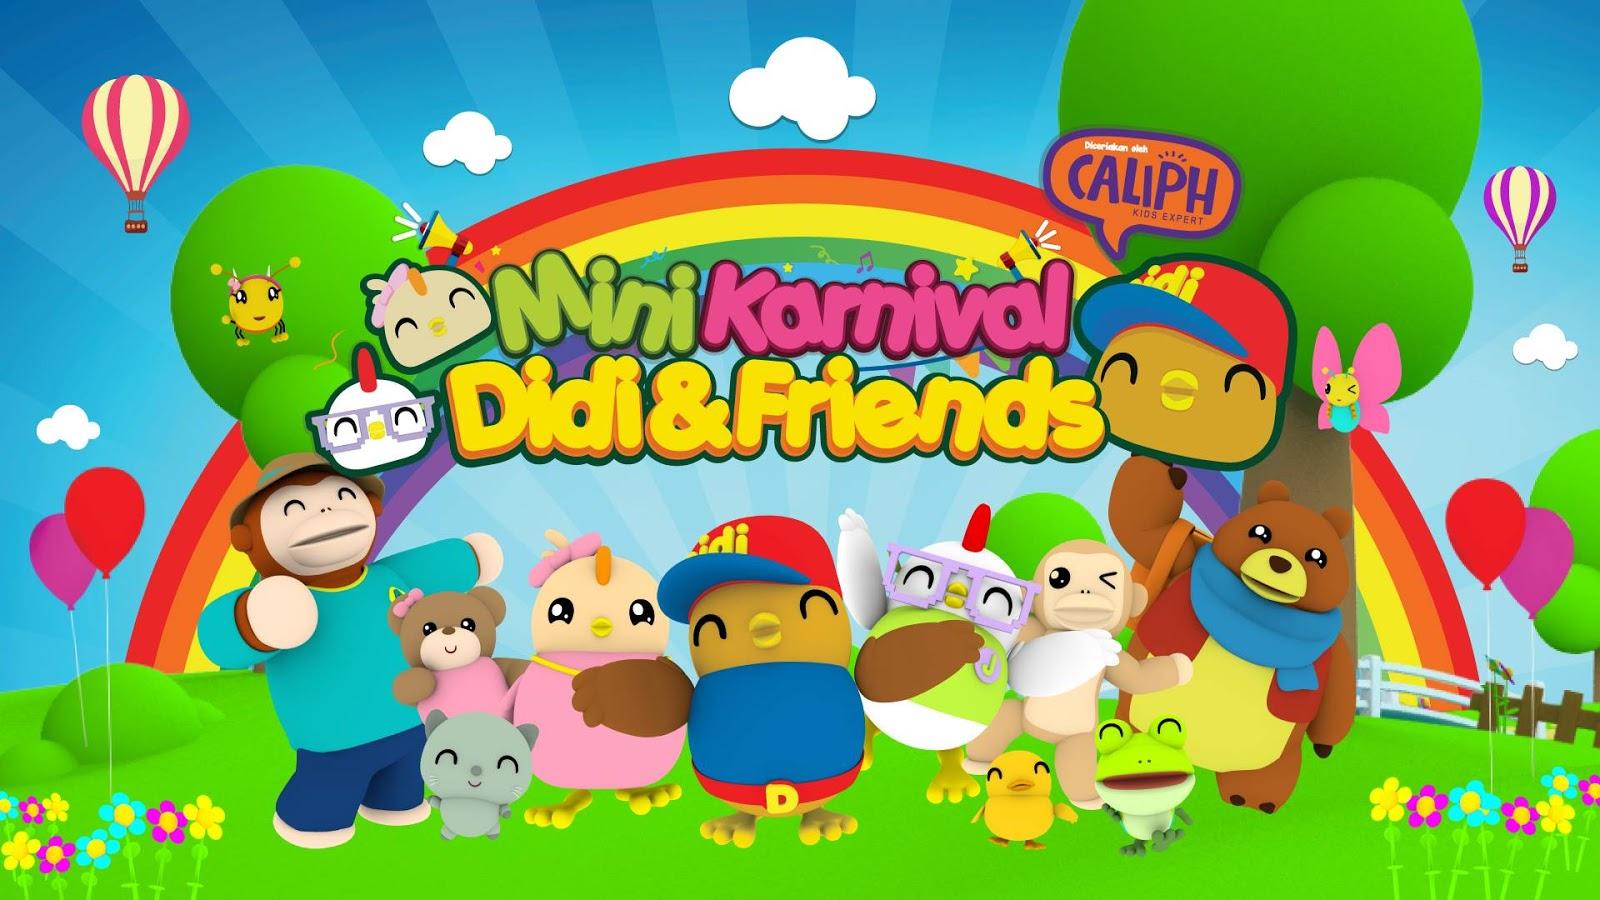 Mini Karnival Didi Amp Friends Di Alamanda Putrajaya